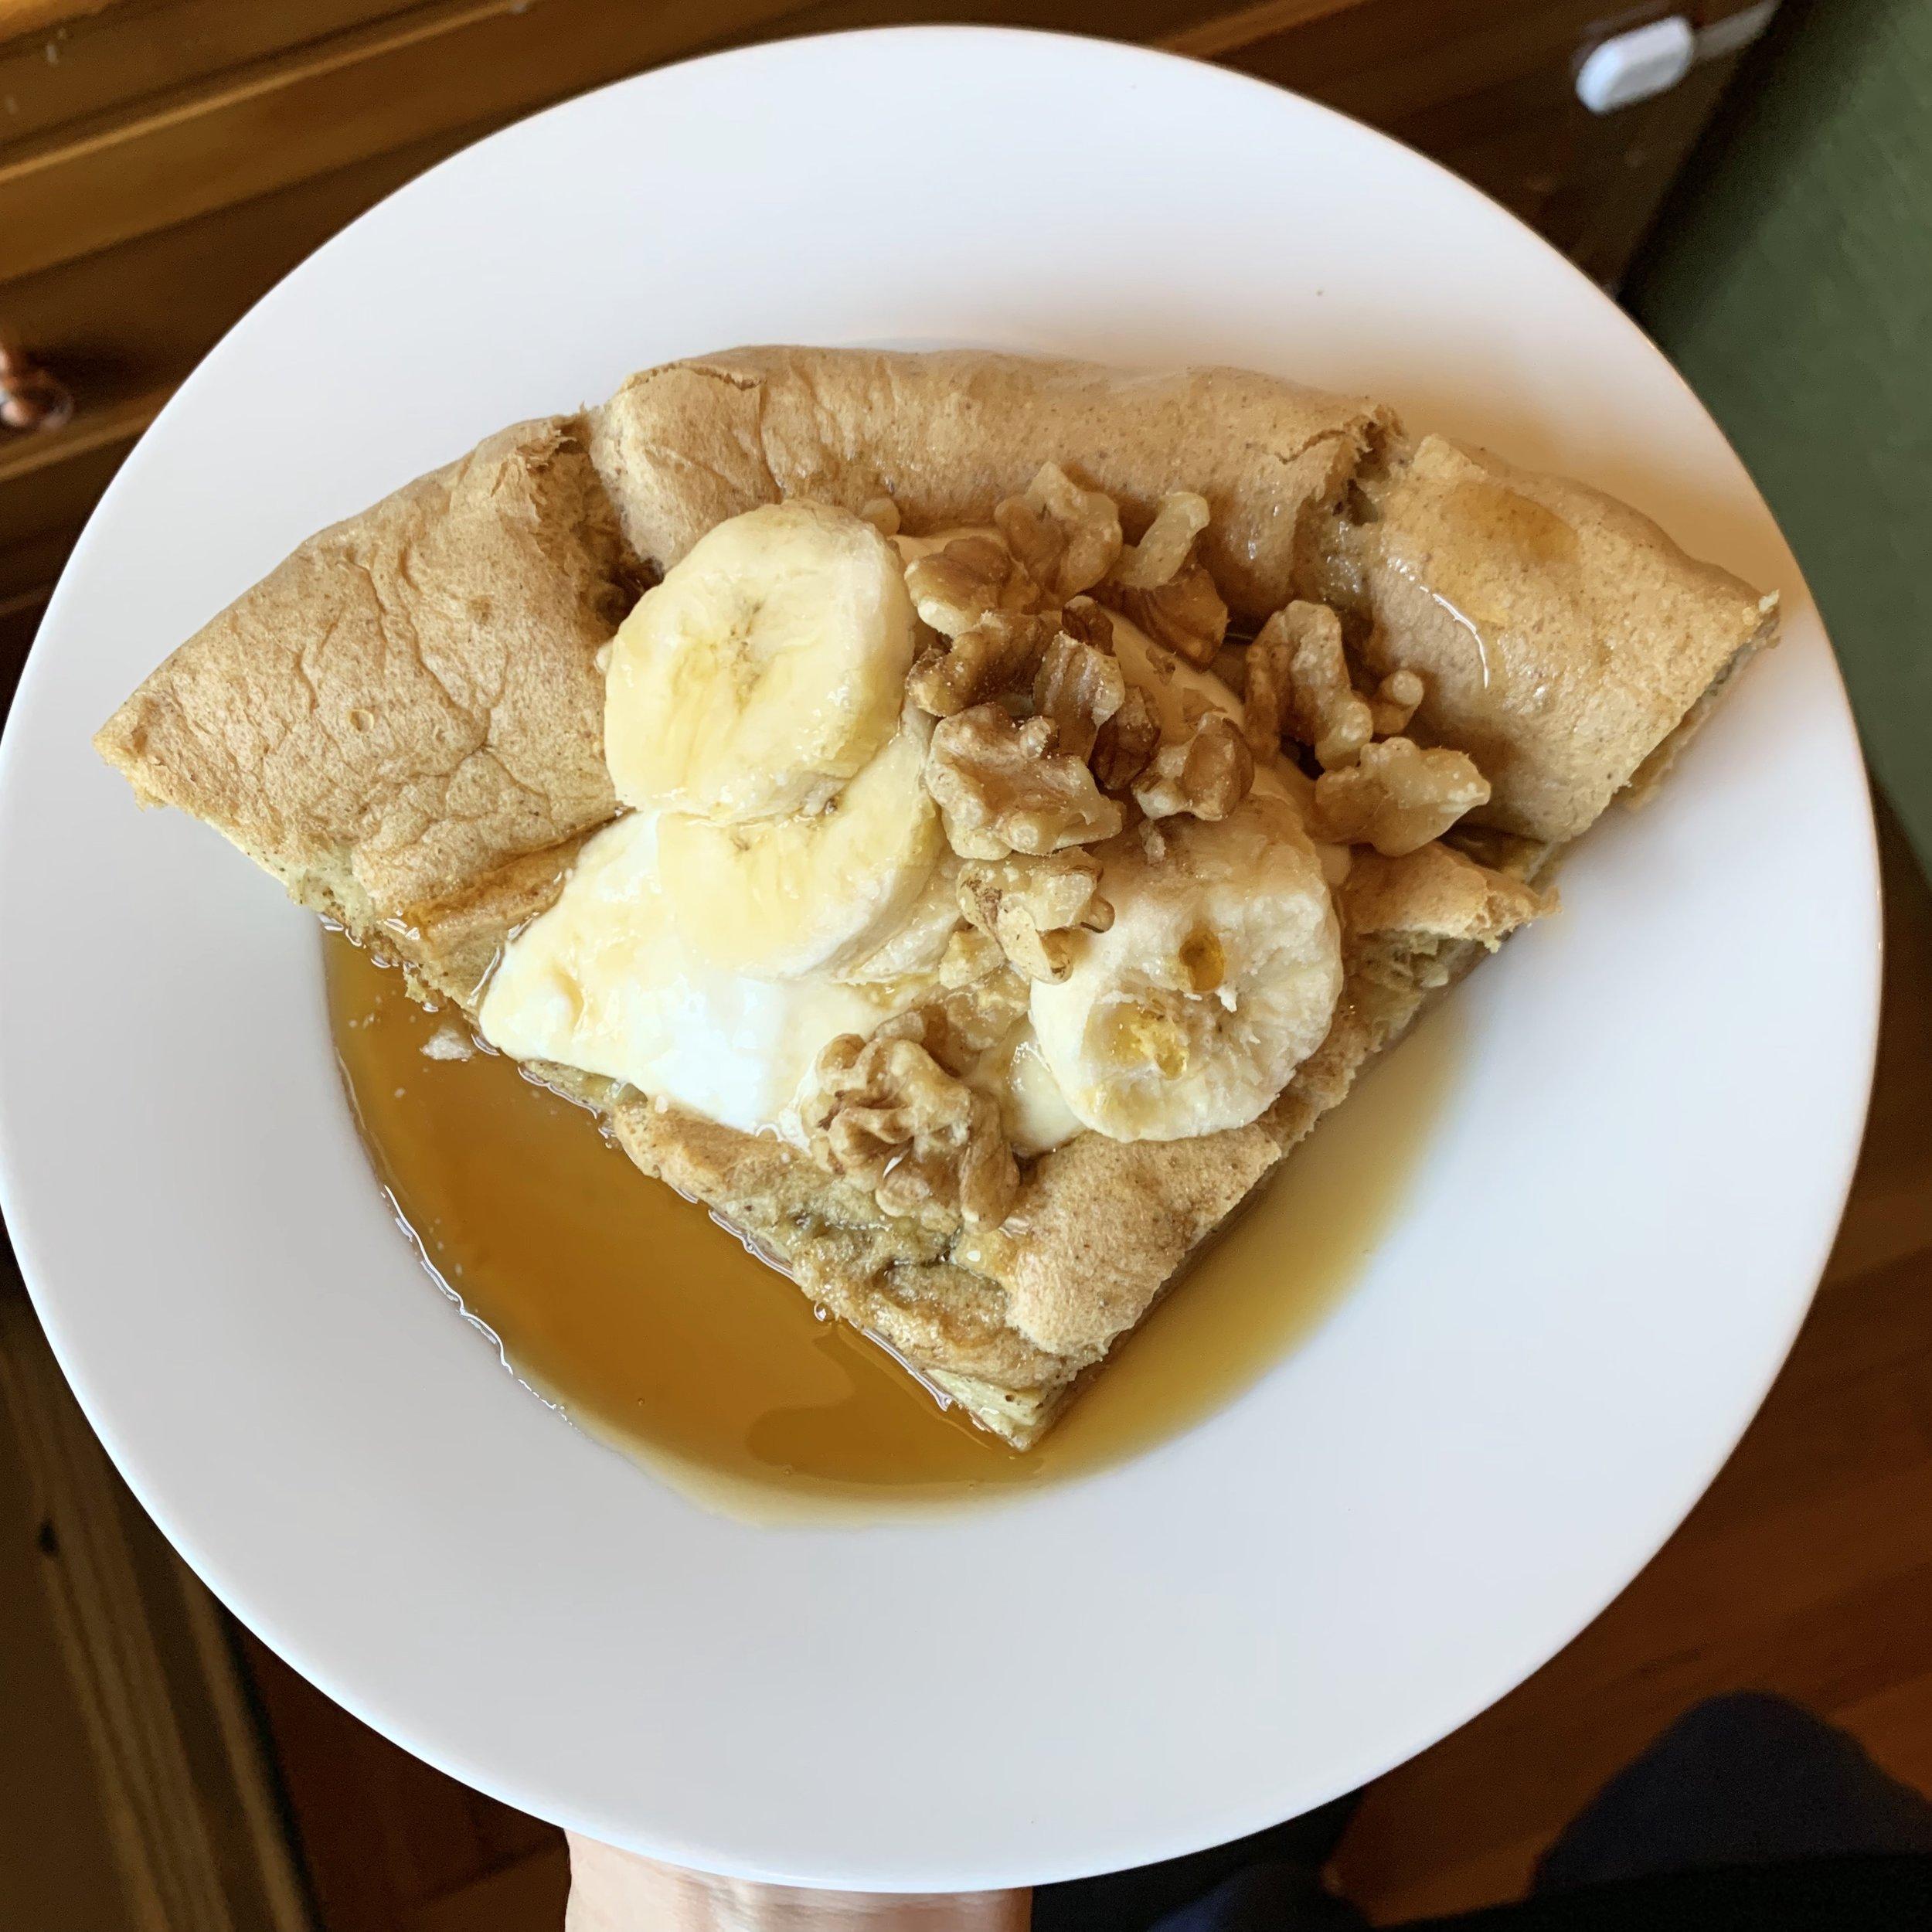 Topped with plain yogurt, banana, walnuts, and maple syrup.